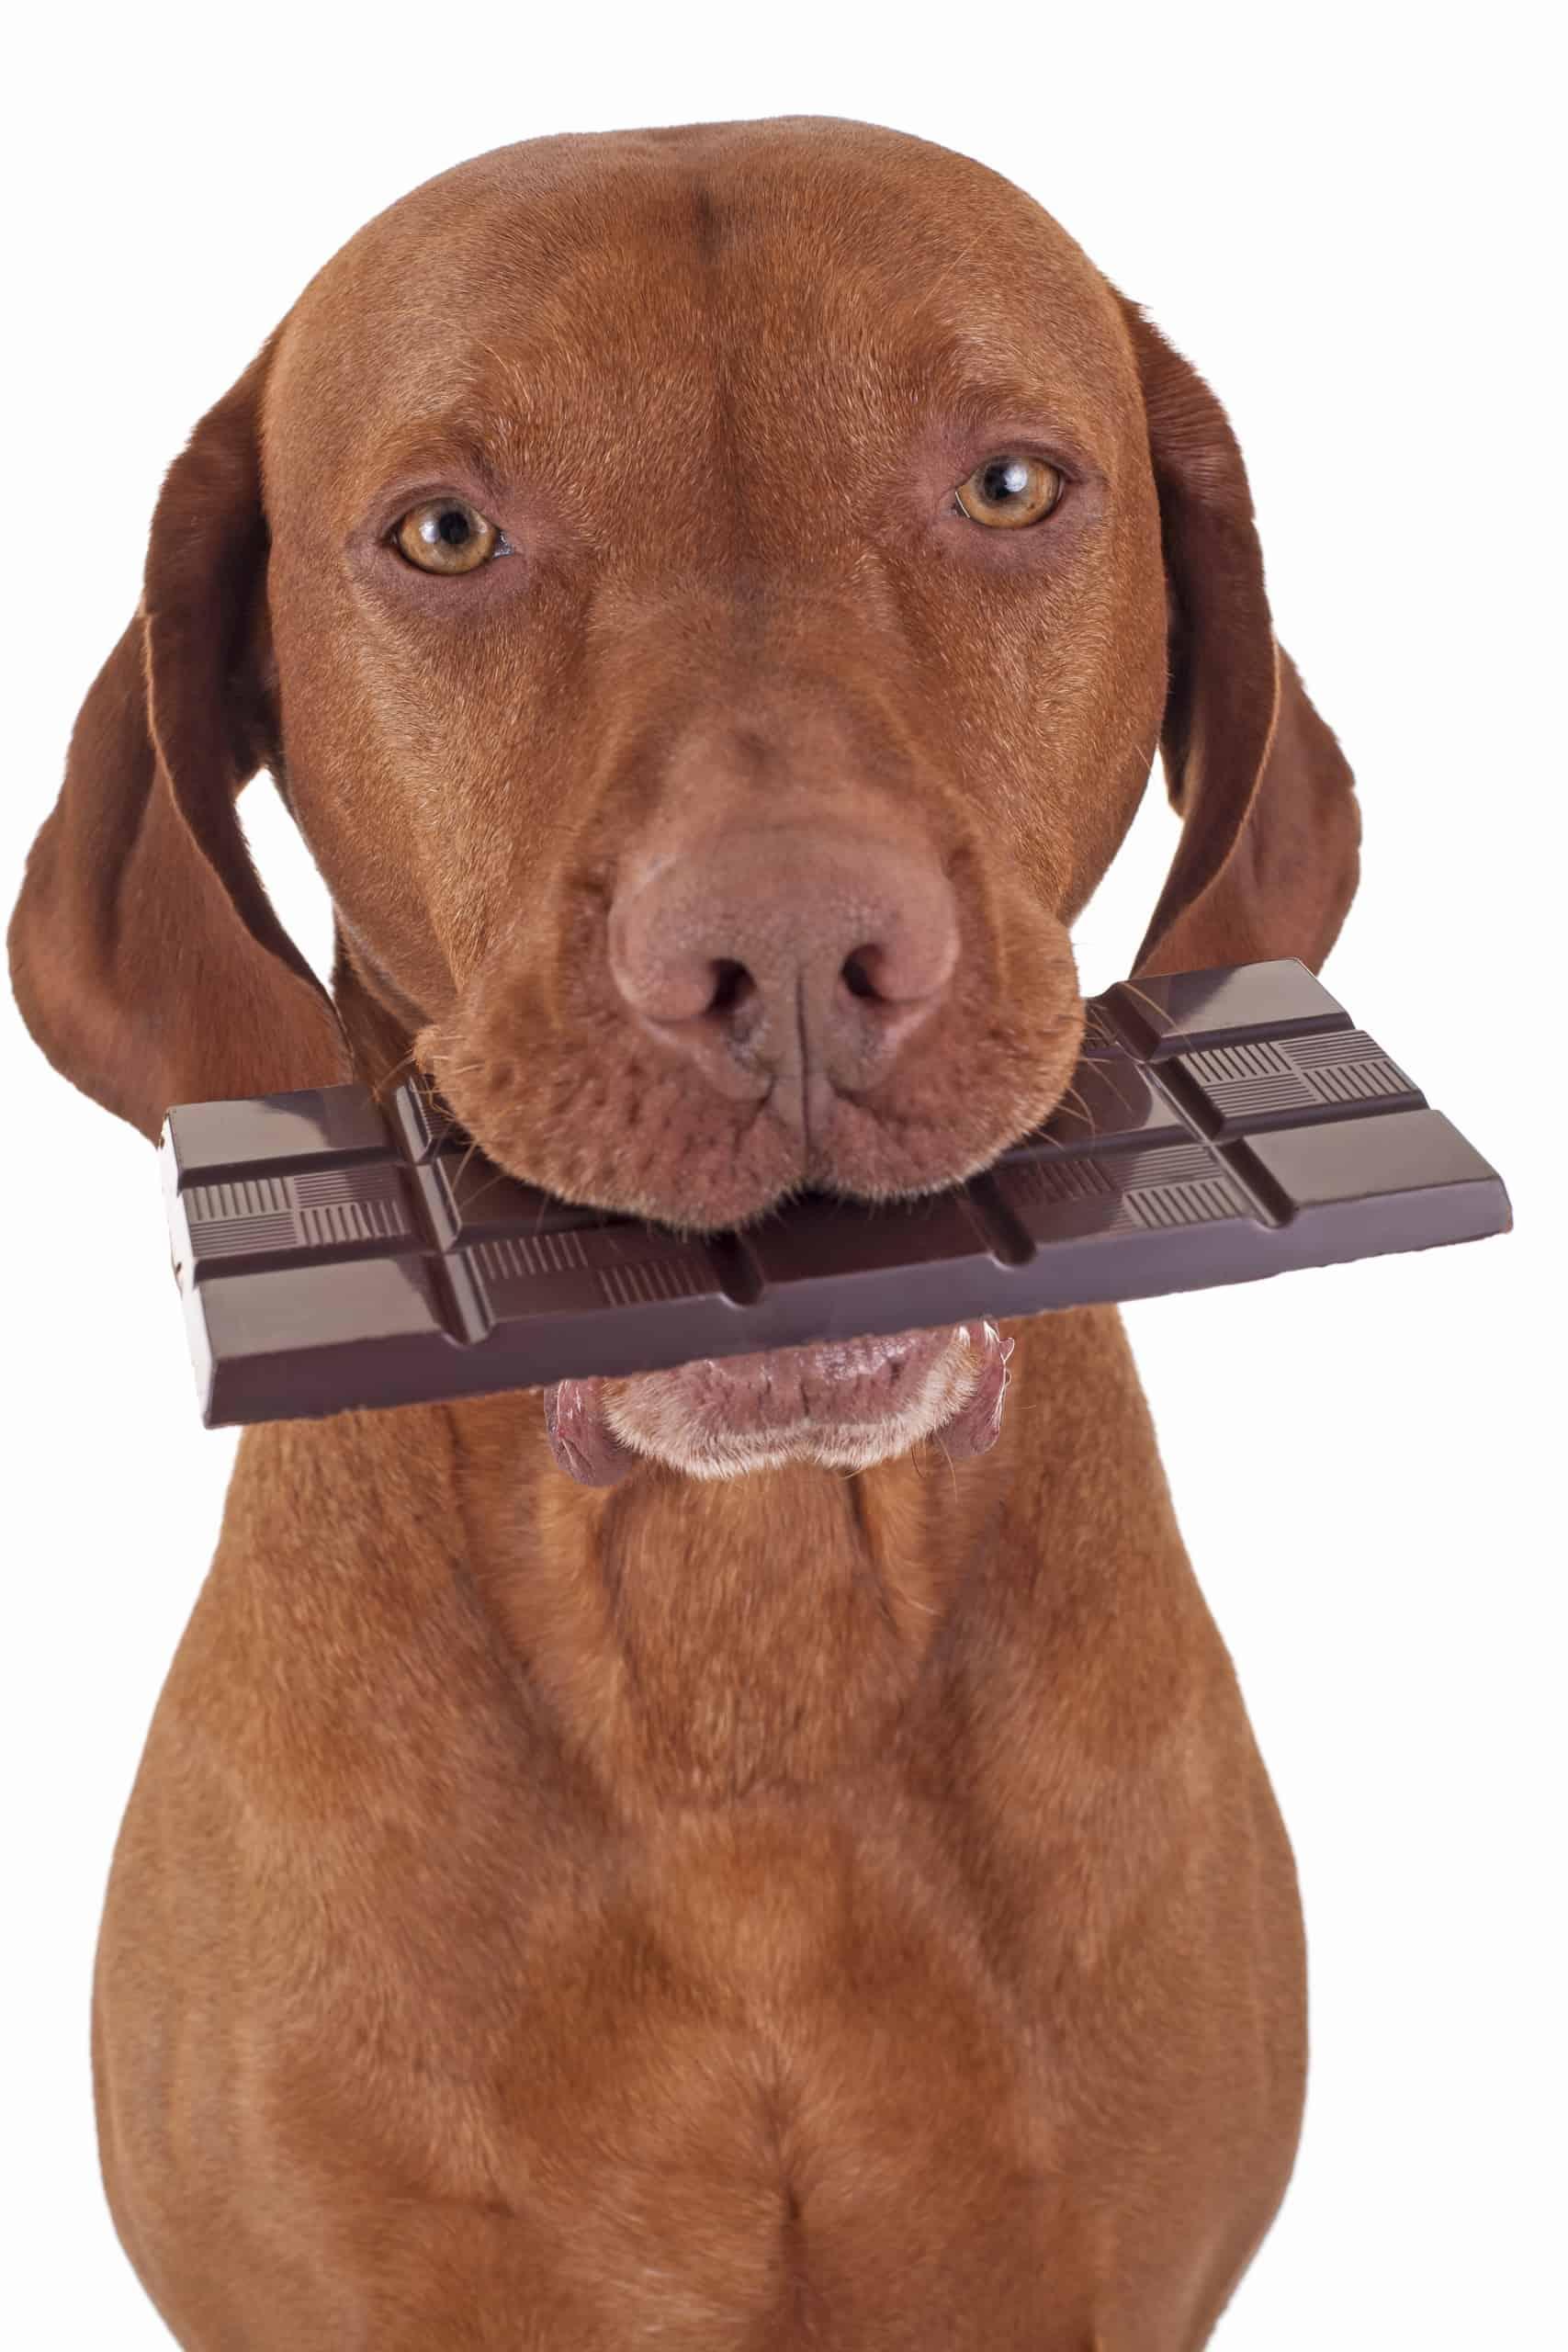 Dog with chocolate slab